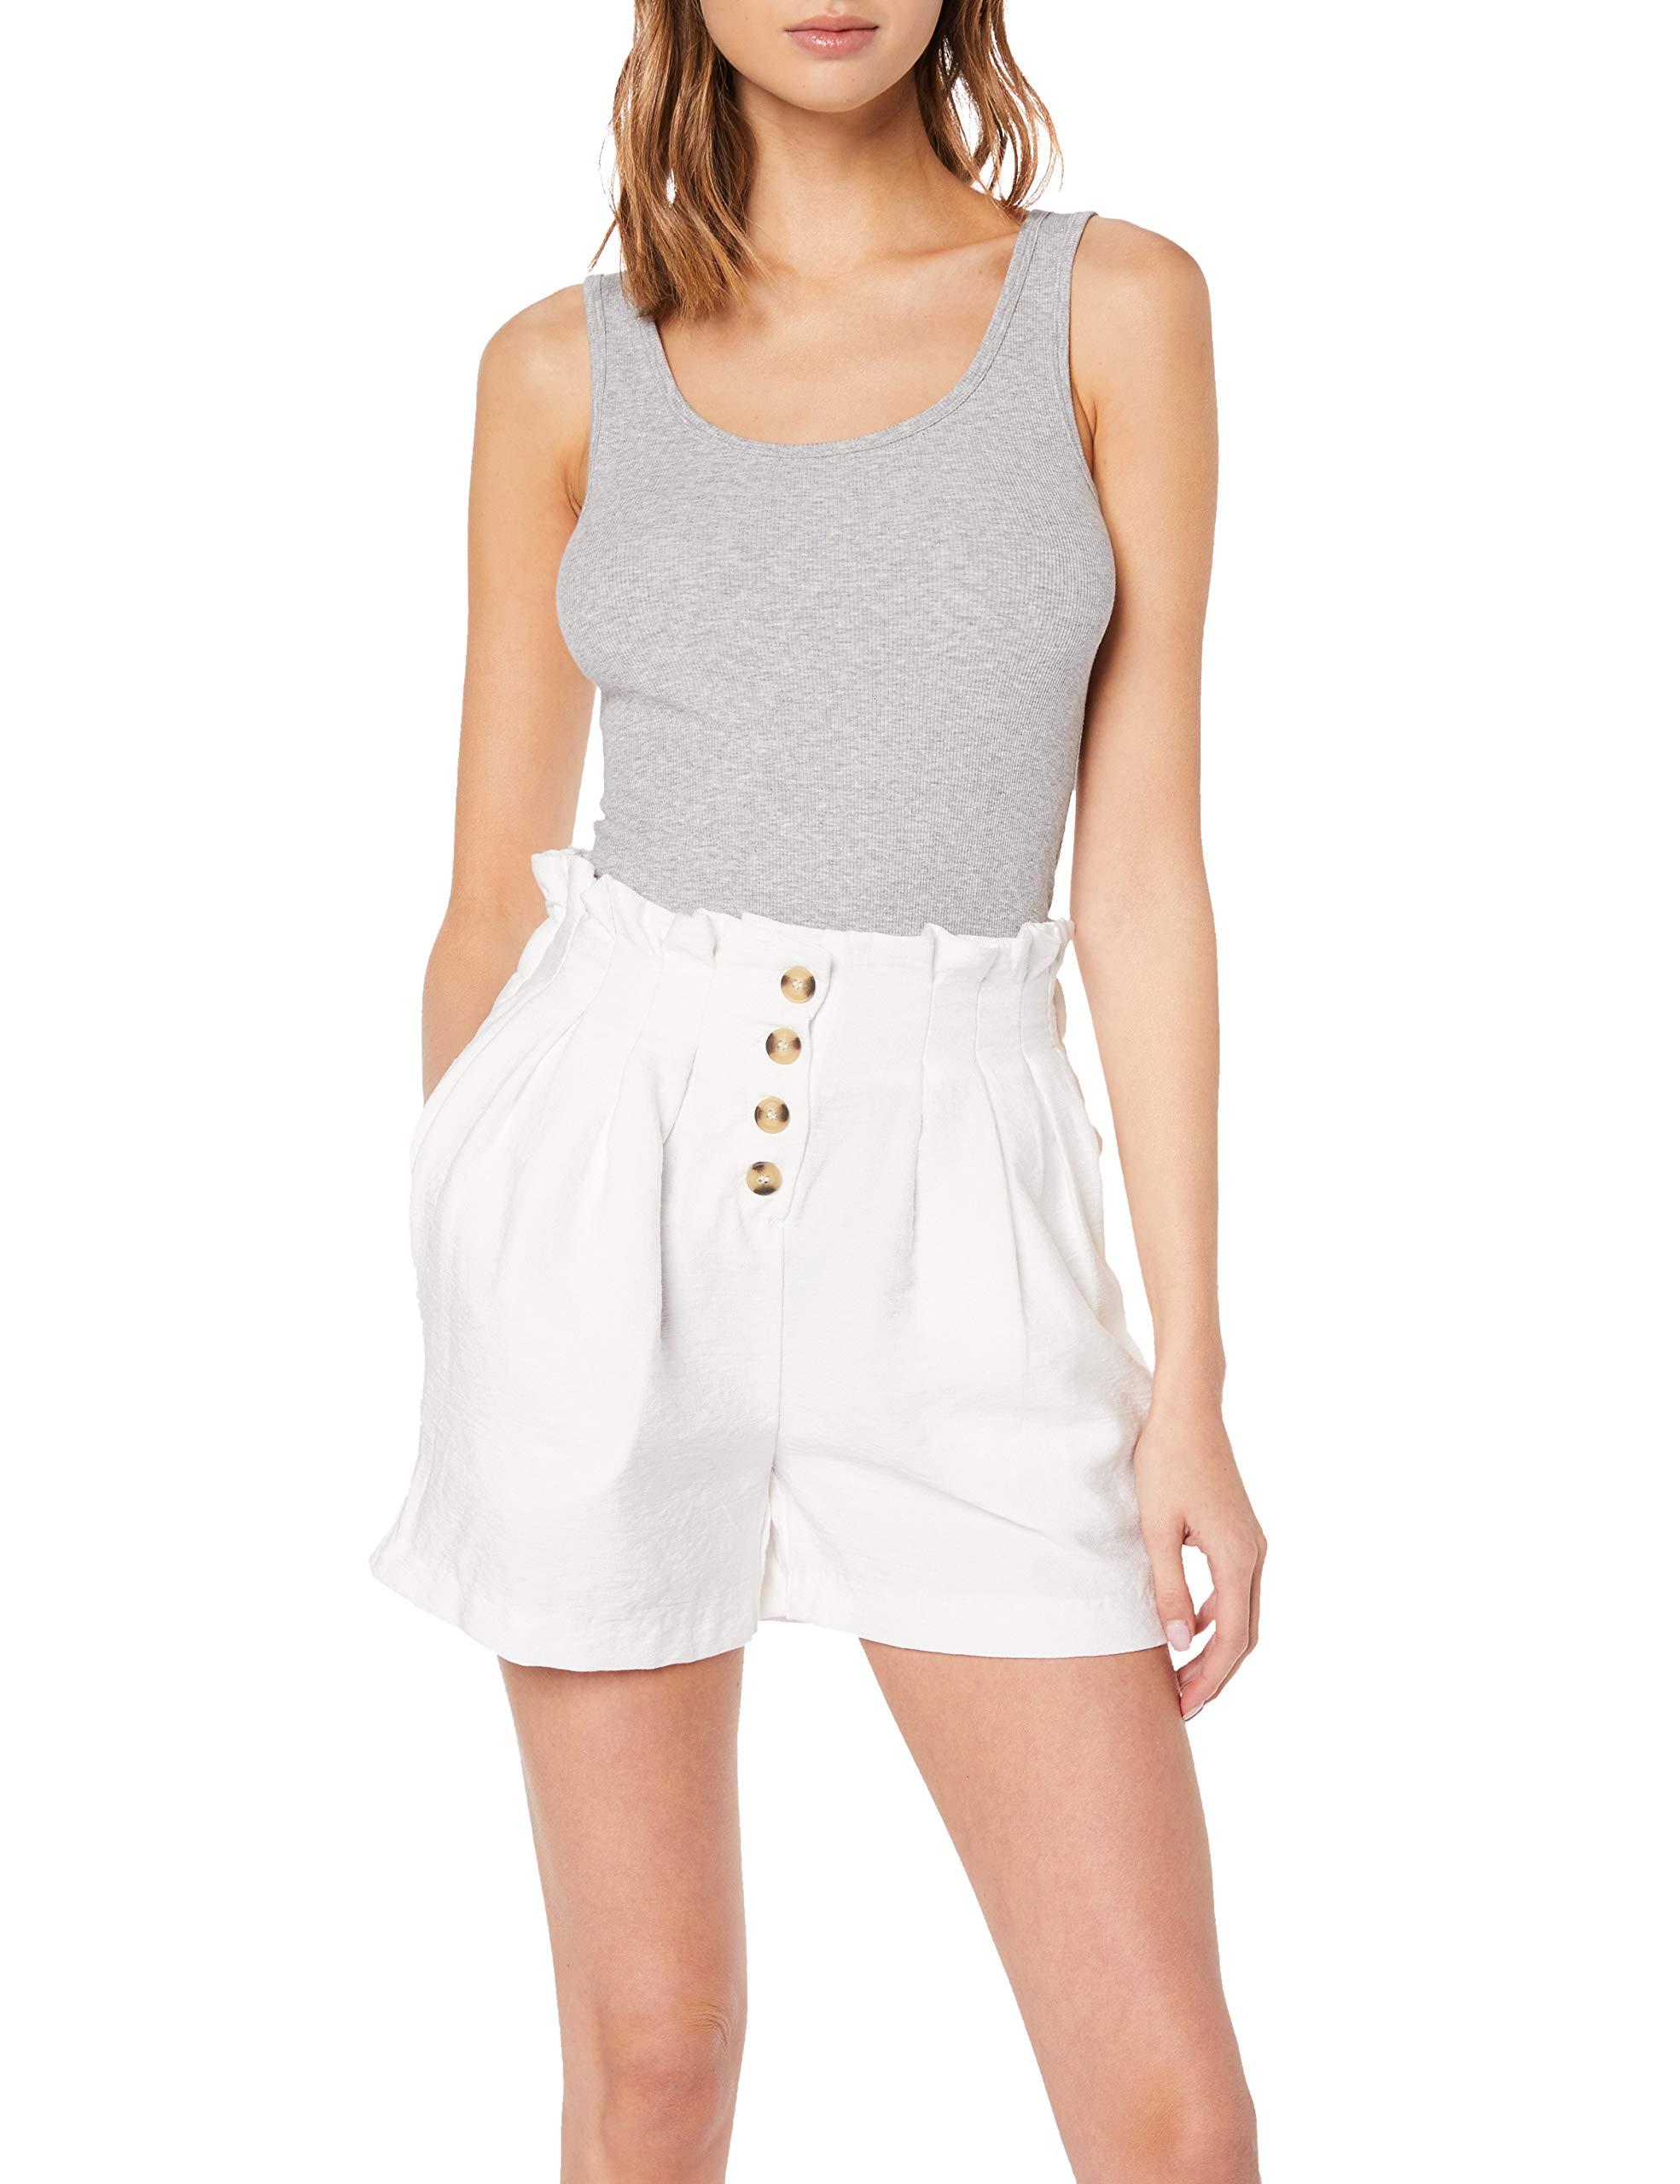 Sparkz Taila WhiteSmalltaille FemmeEcruoff FabricantSmall ShortsShort Ow0knP